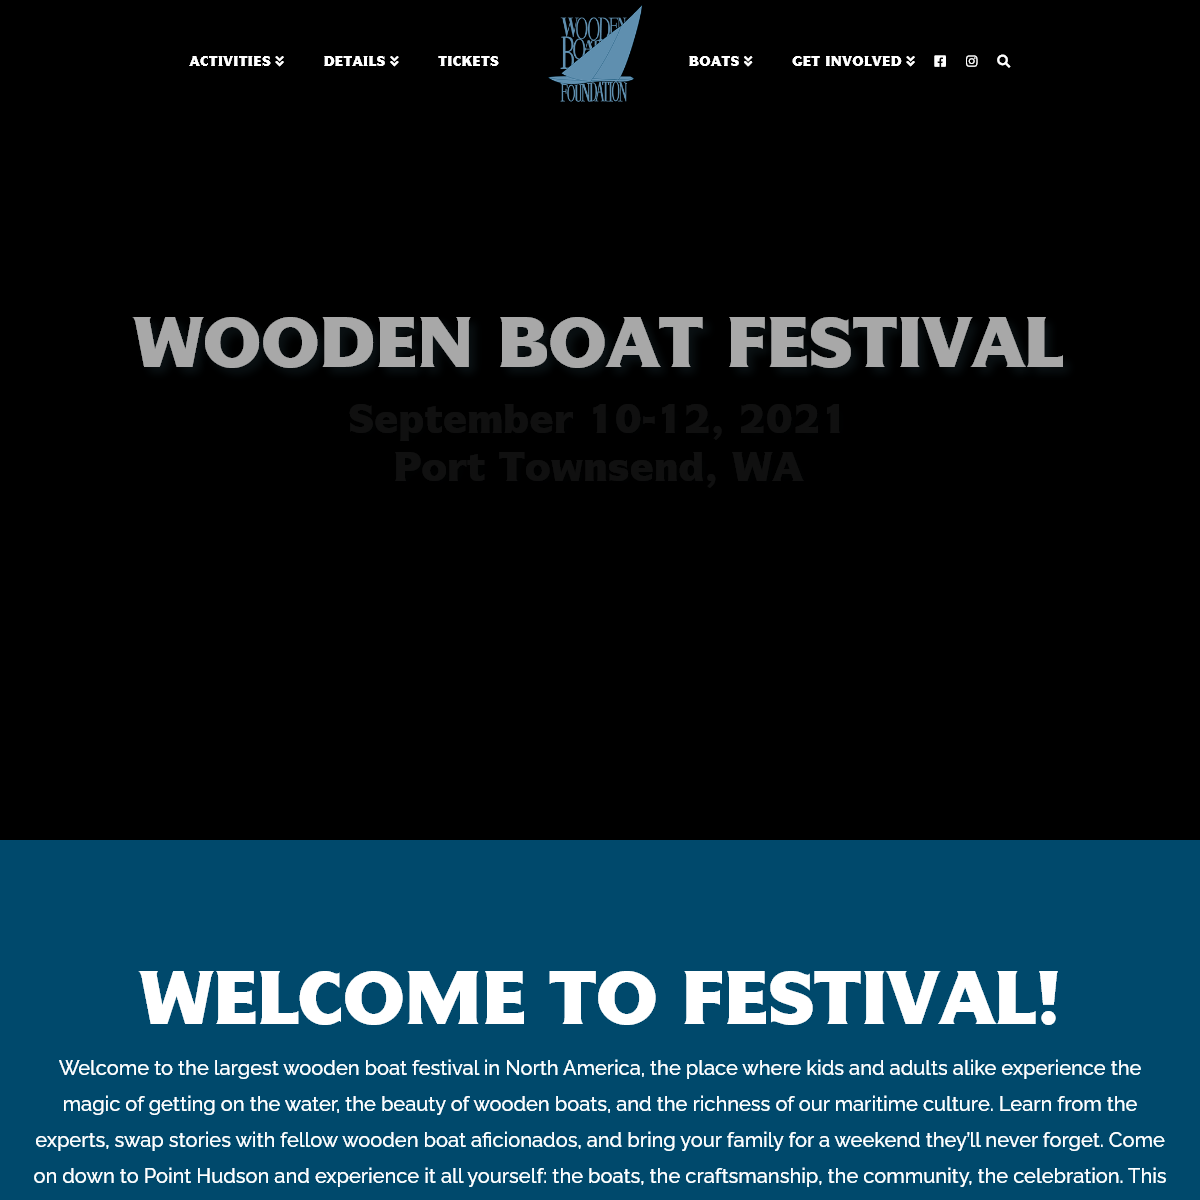 Wooden Boat Festival - Port Townsend Wooden Boat Festival